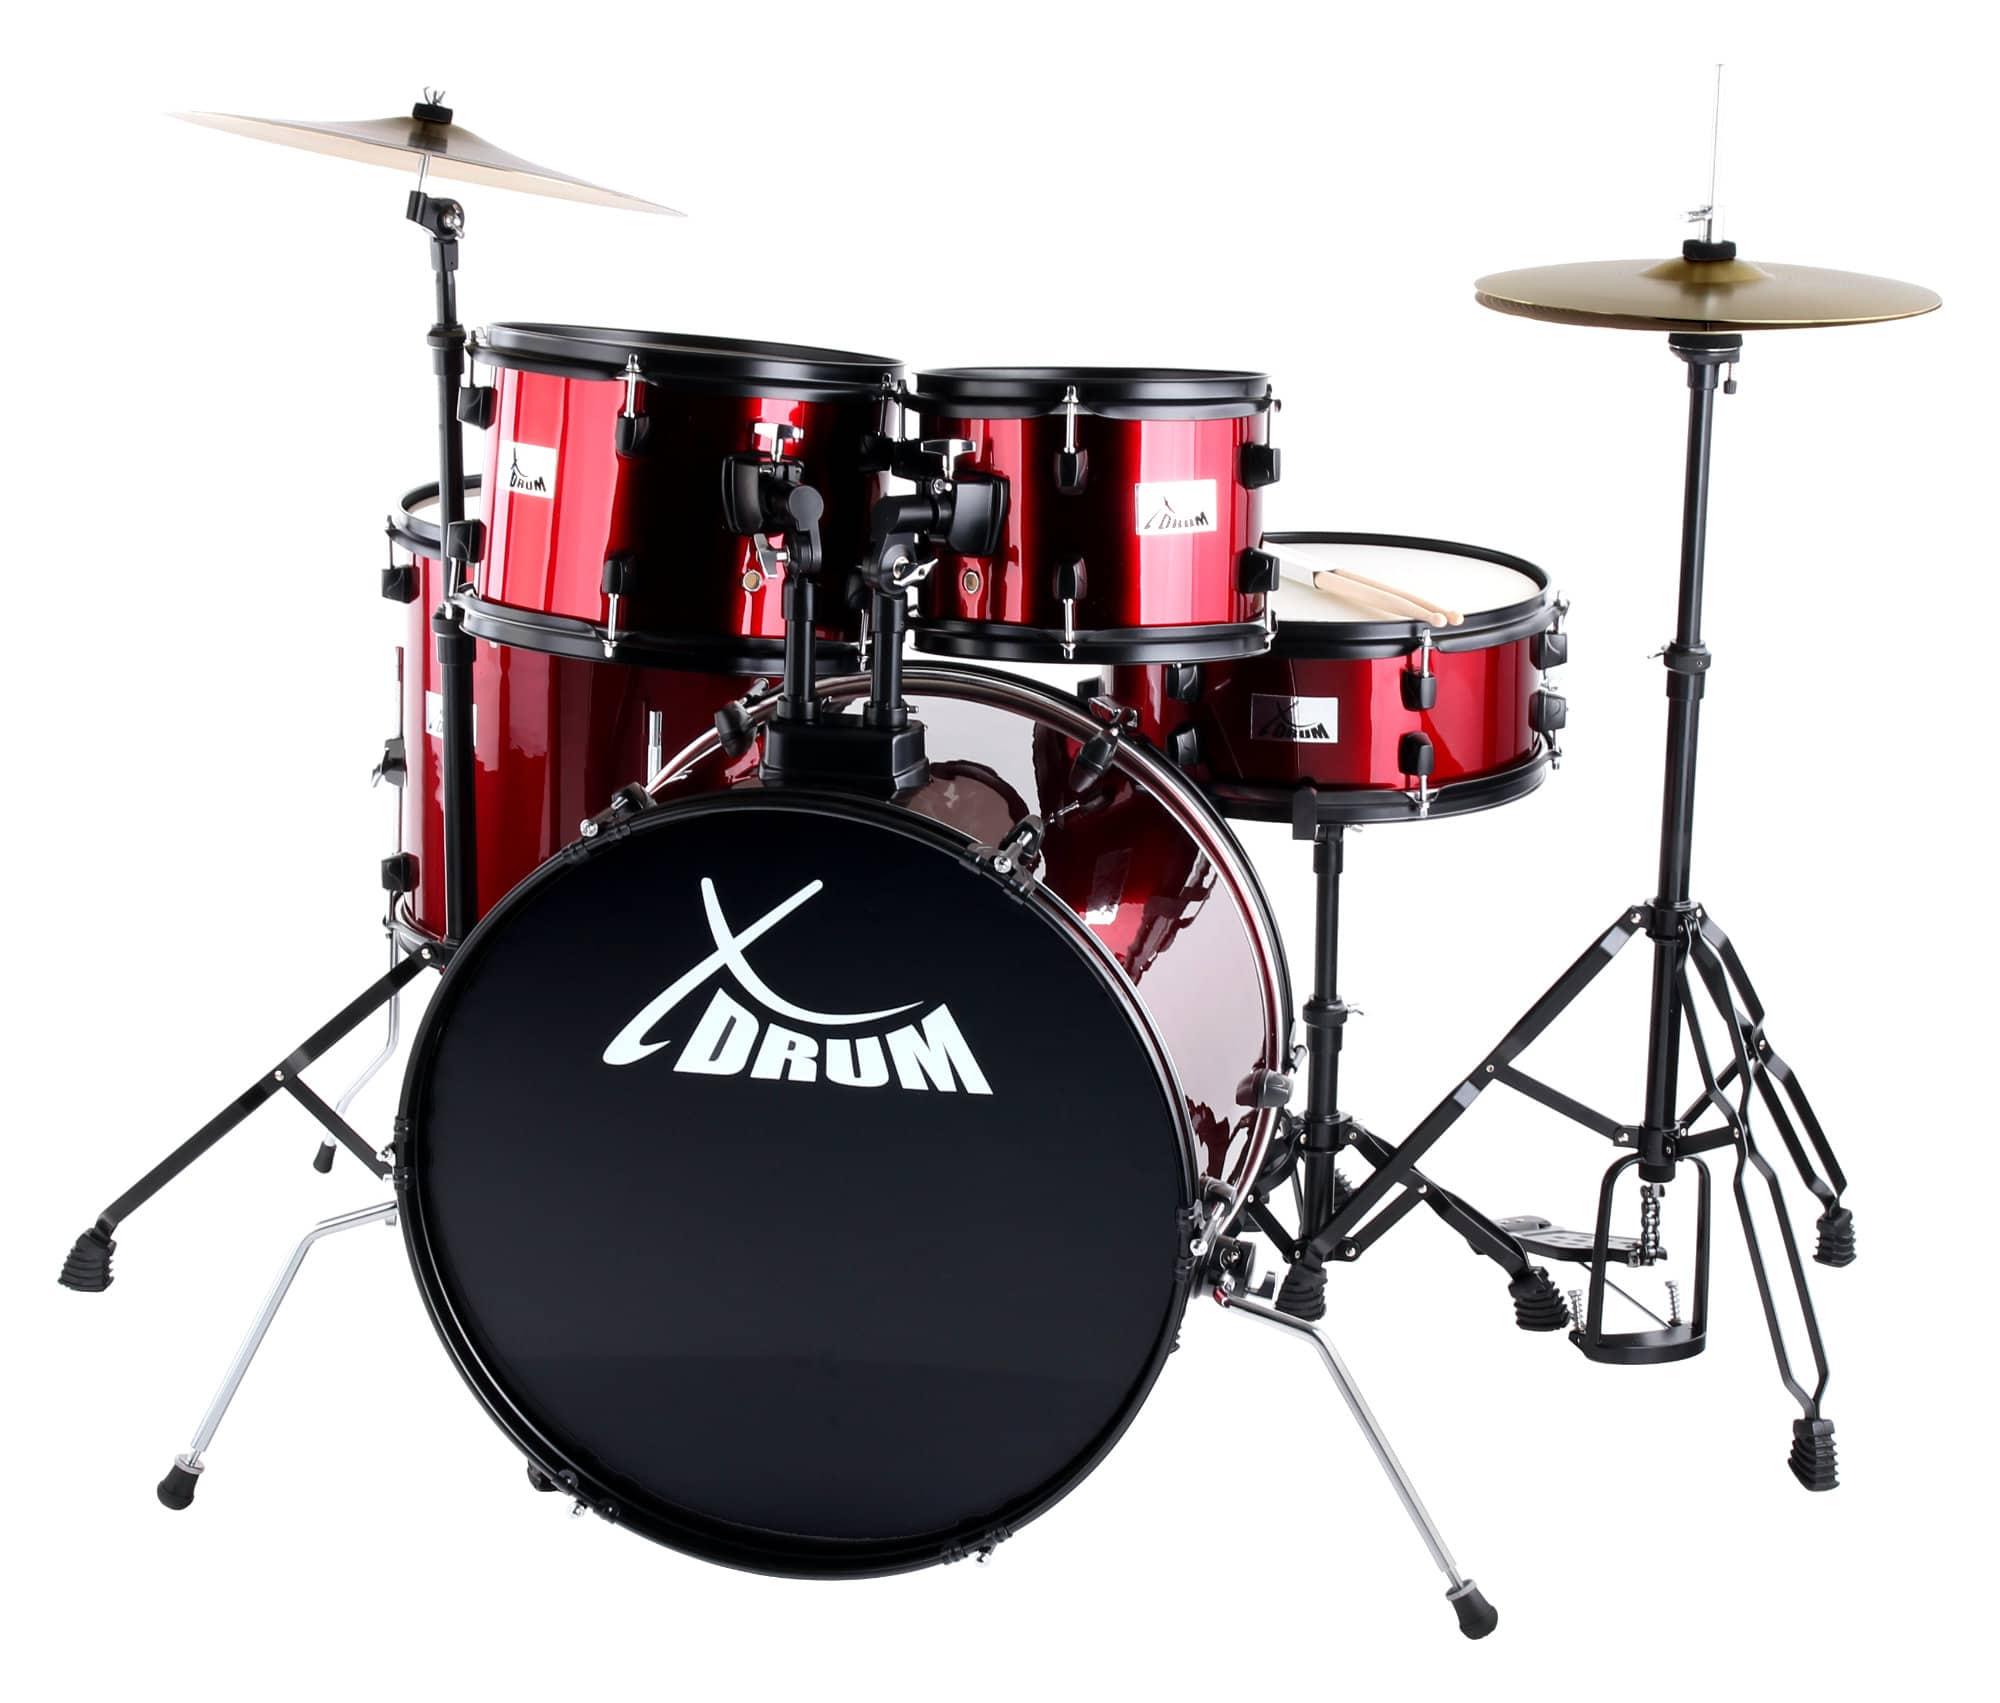 XDrum Rookie 22' Fusion Schlagzeug Komplettset Ruby Red inkl. Schule DVD